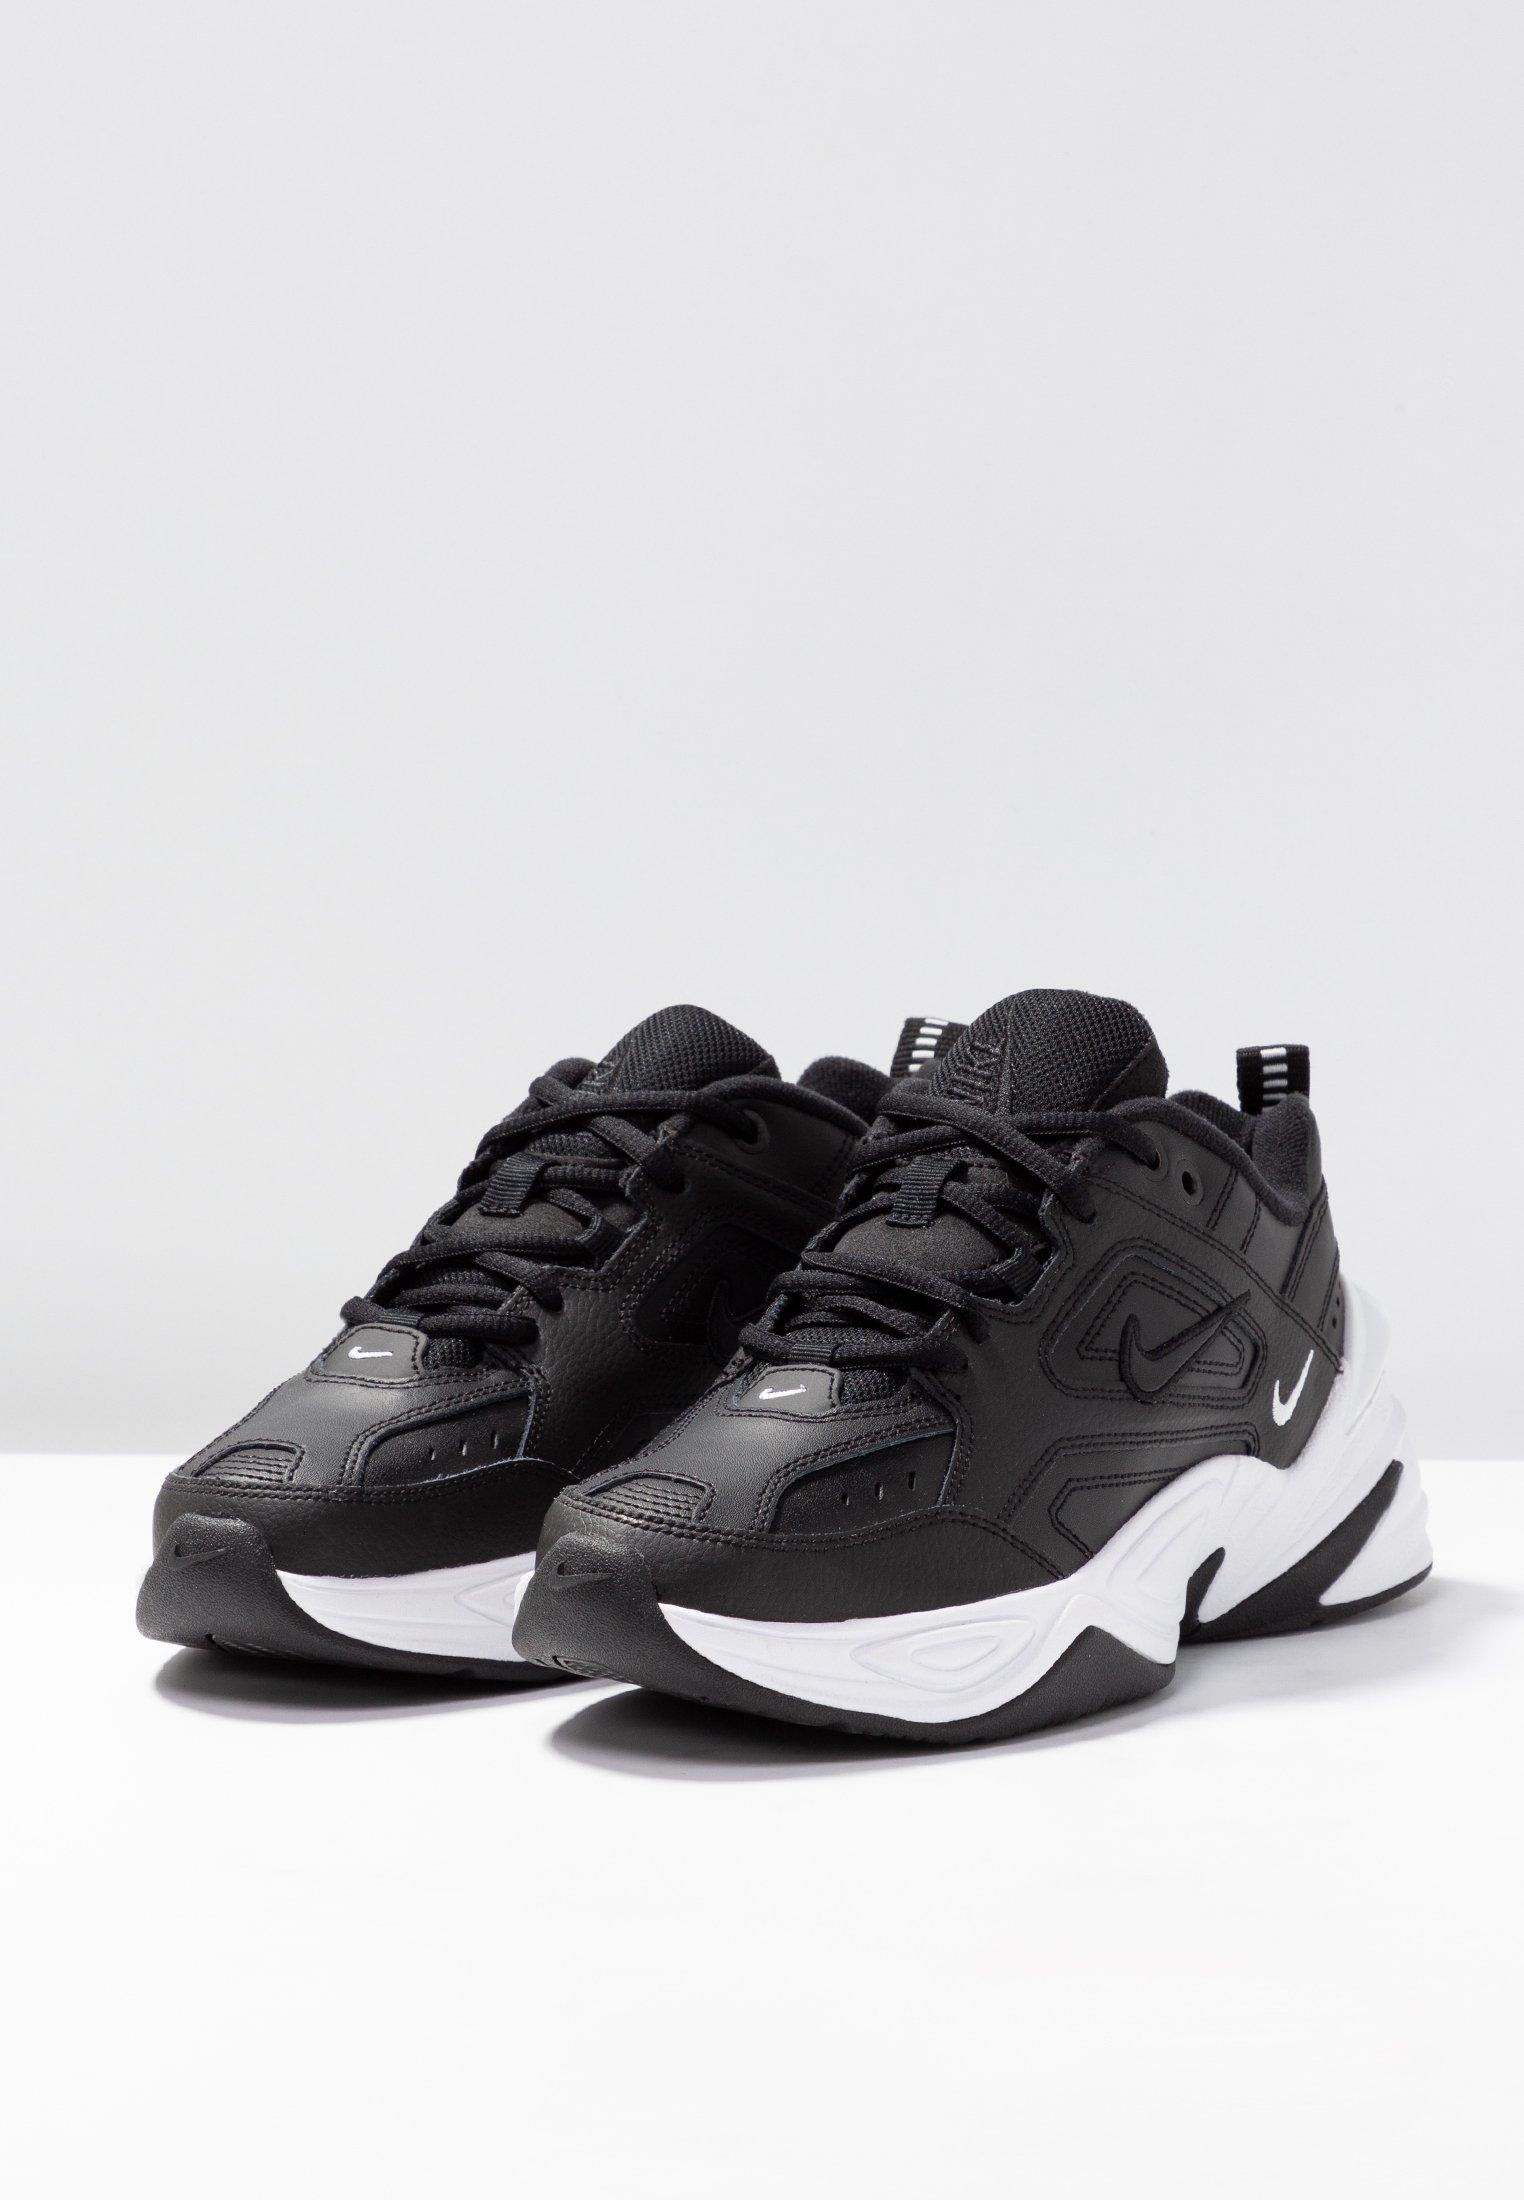 Basse Black Sportswear M2k TeknoSneakers Nike white mN08wPynvO